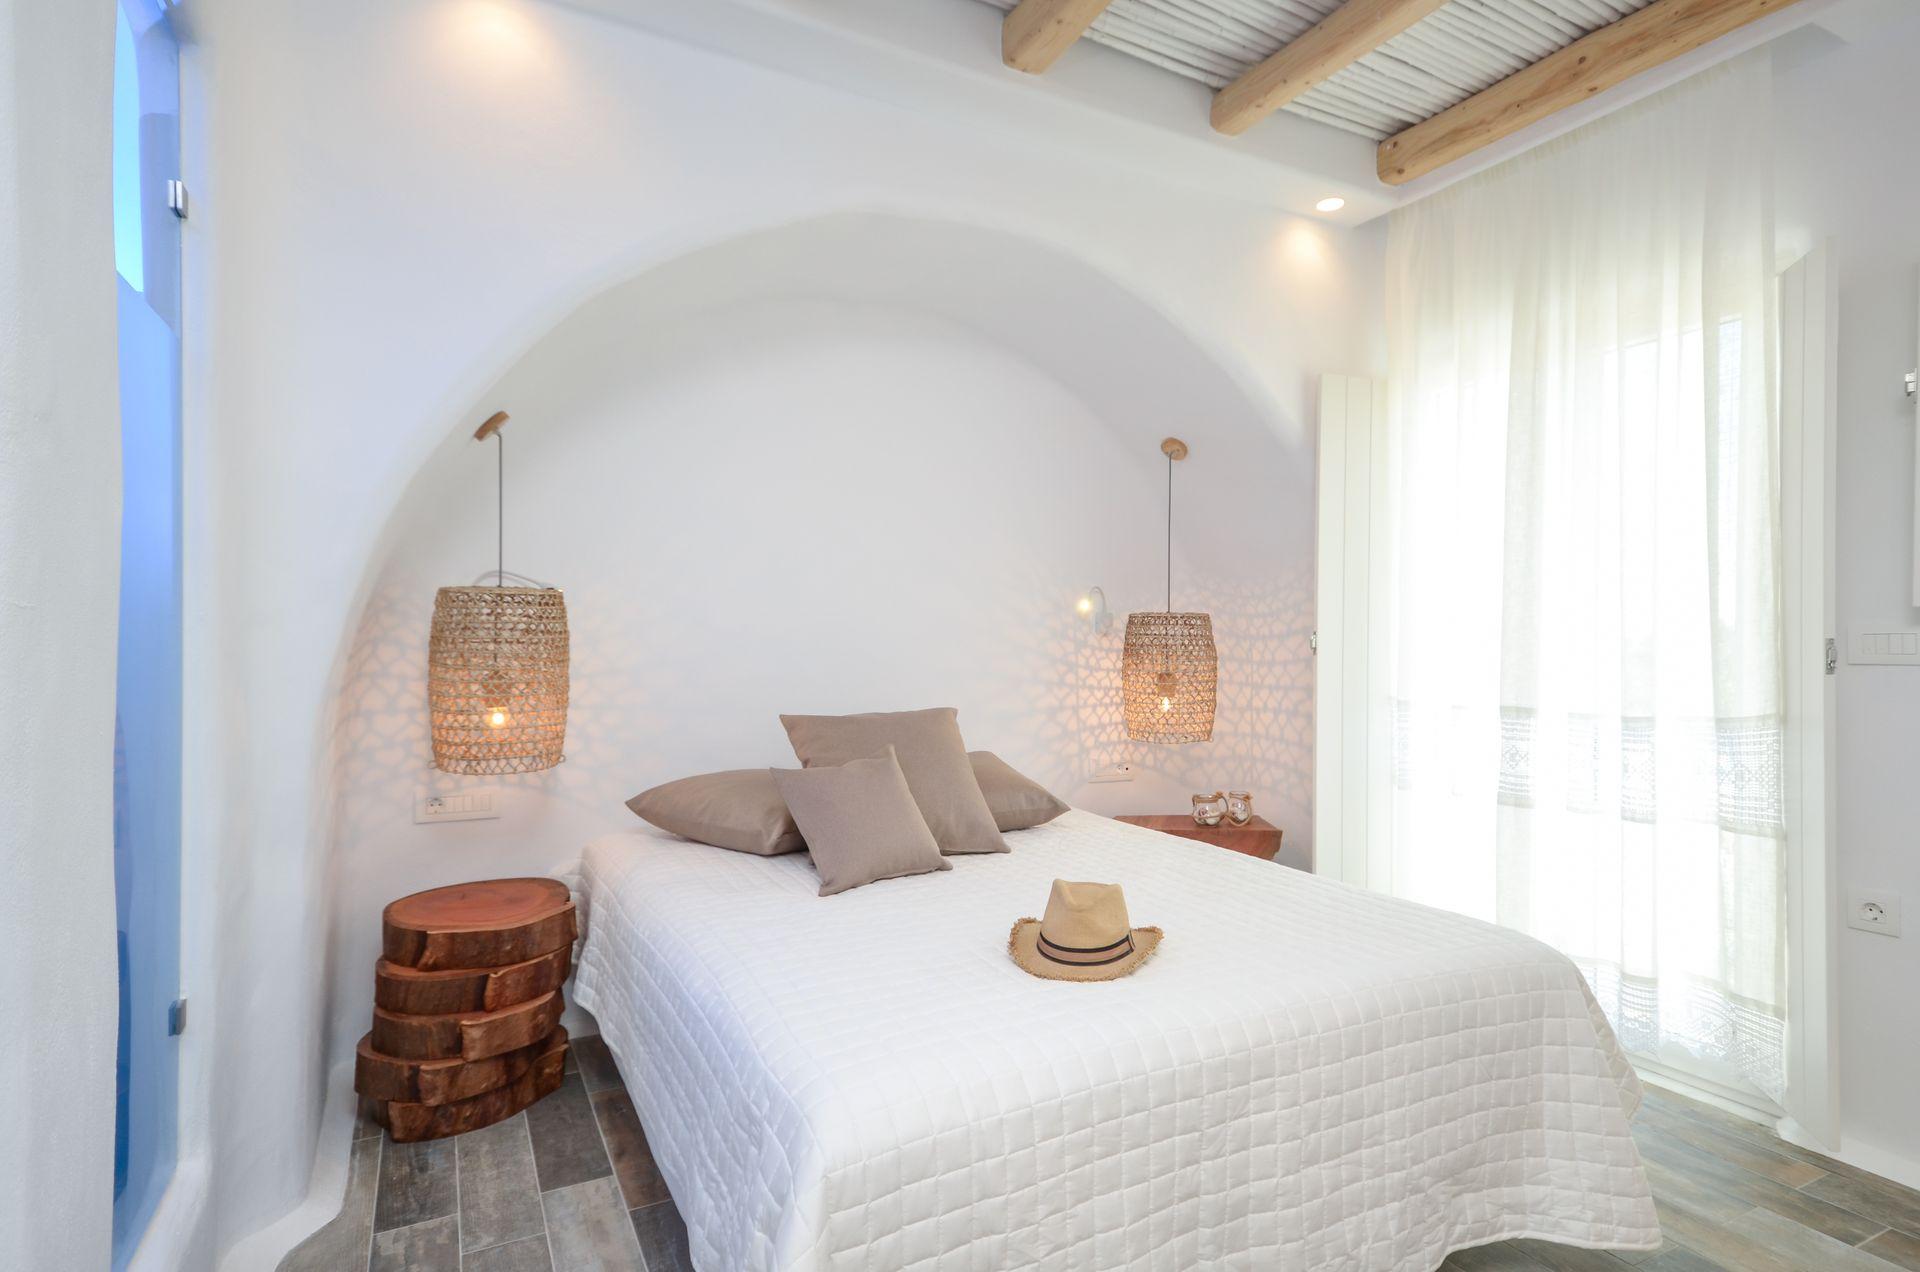 4* Naxos Island Escape - Πλάκα, Νάξος εικόνα